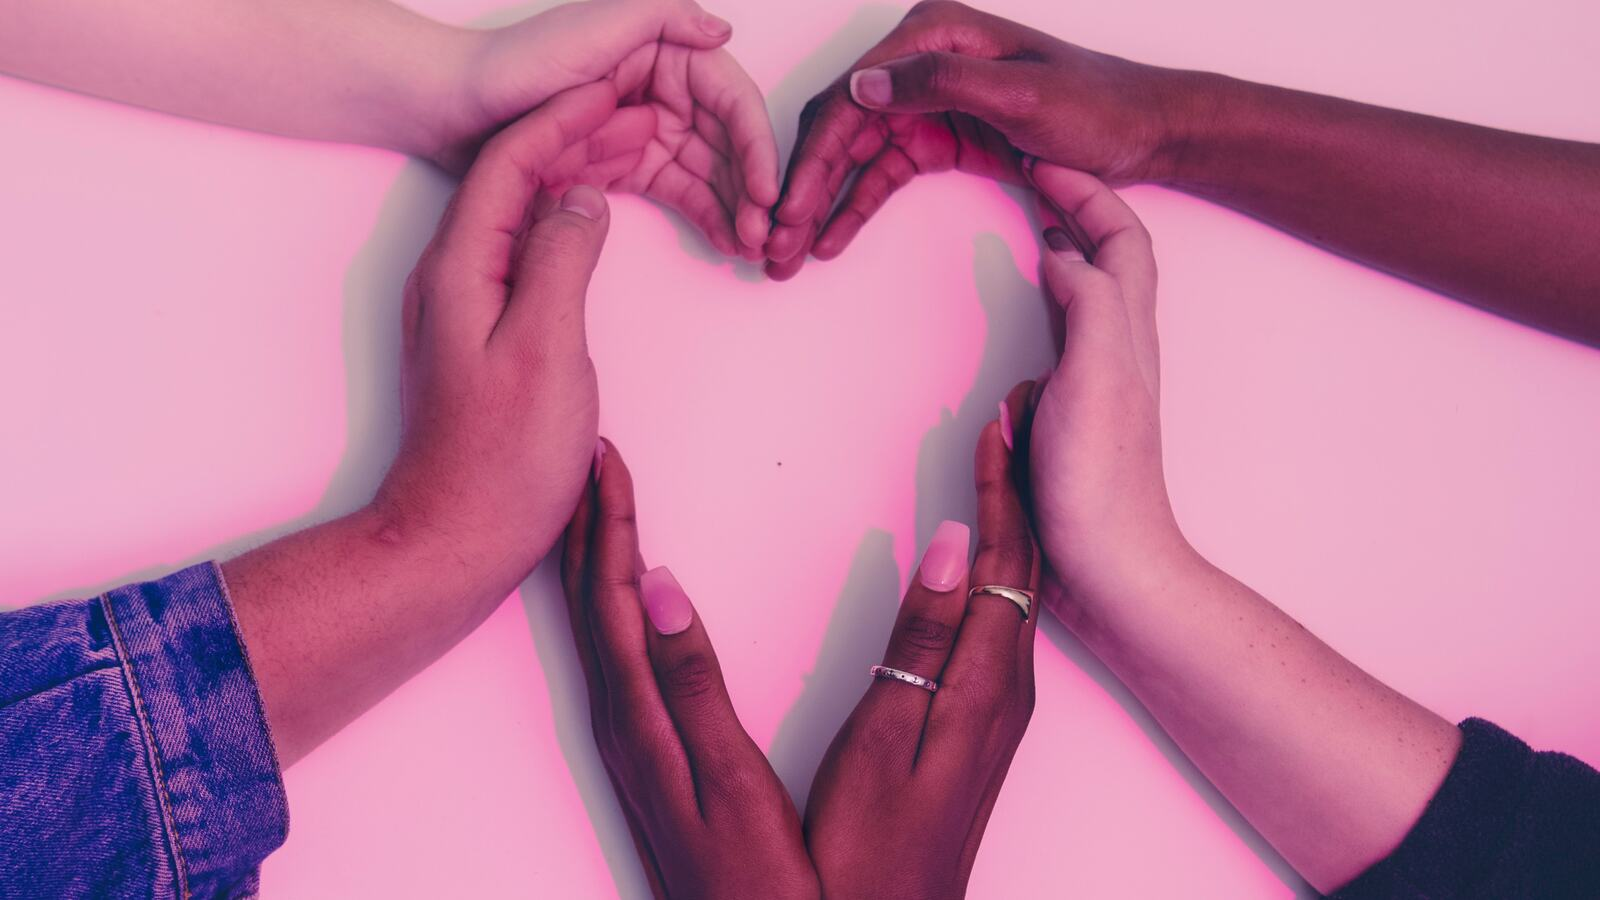 Hands used to create heart shape